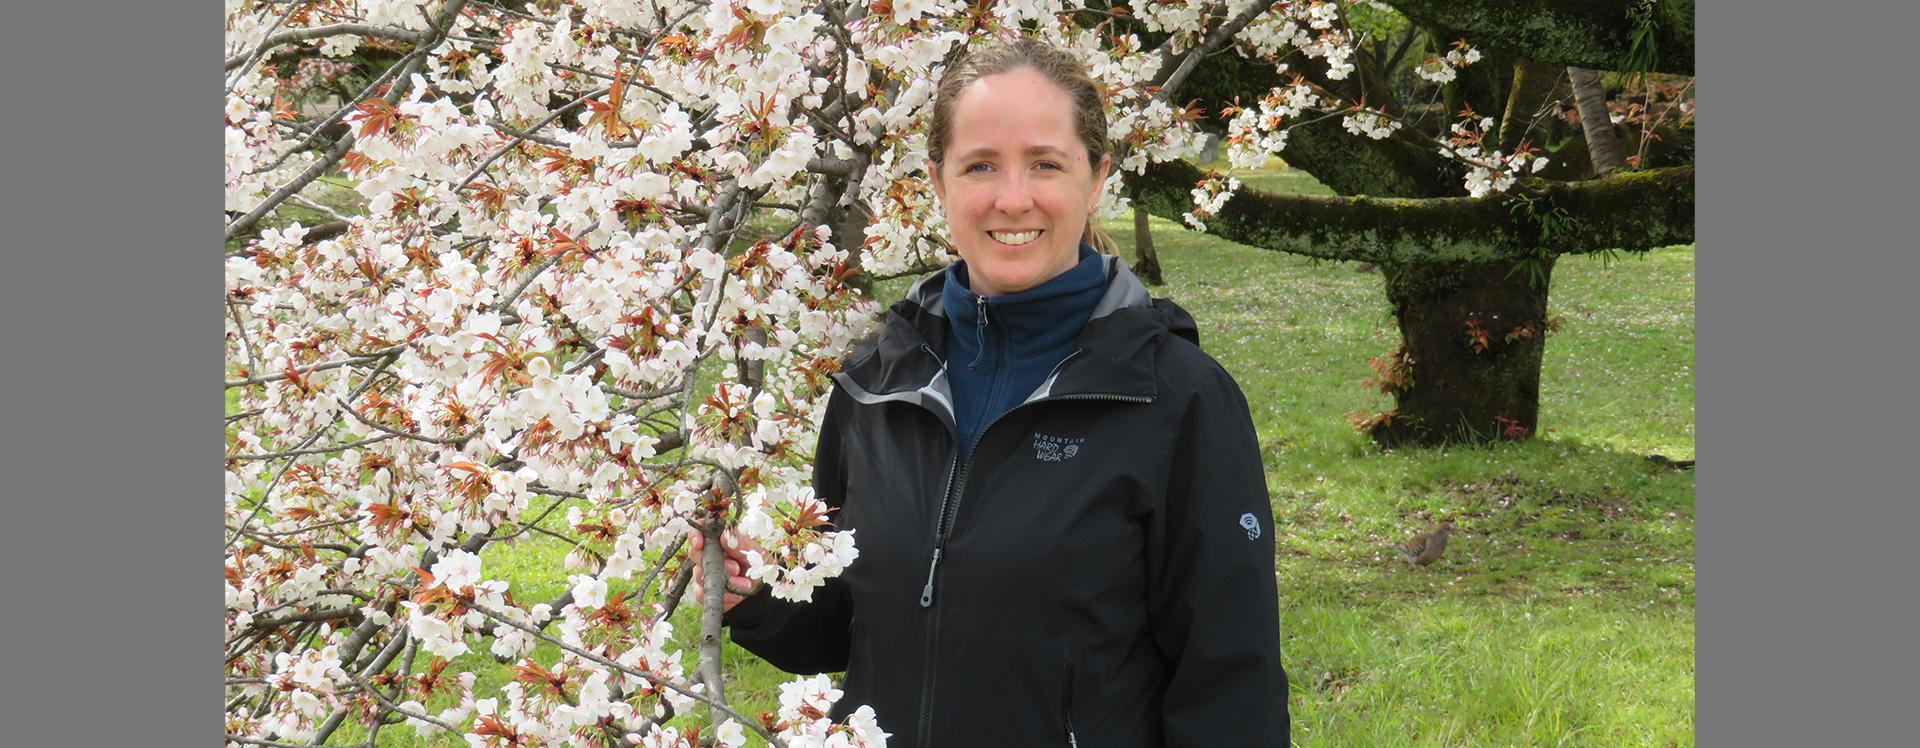 Meet UW Applied Biotechnology's Program Manager: Dr. Melinda Verdone